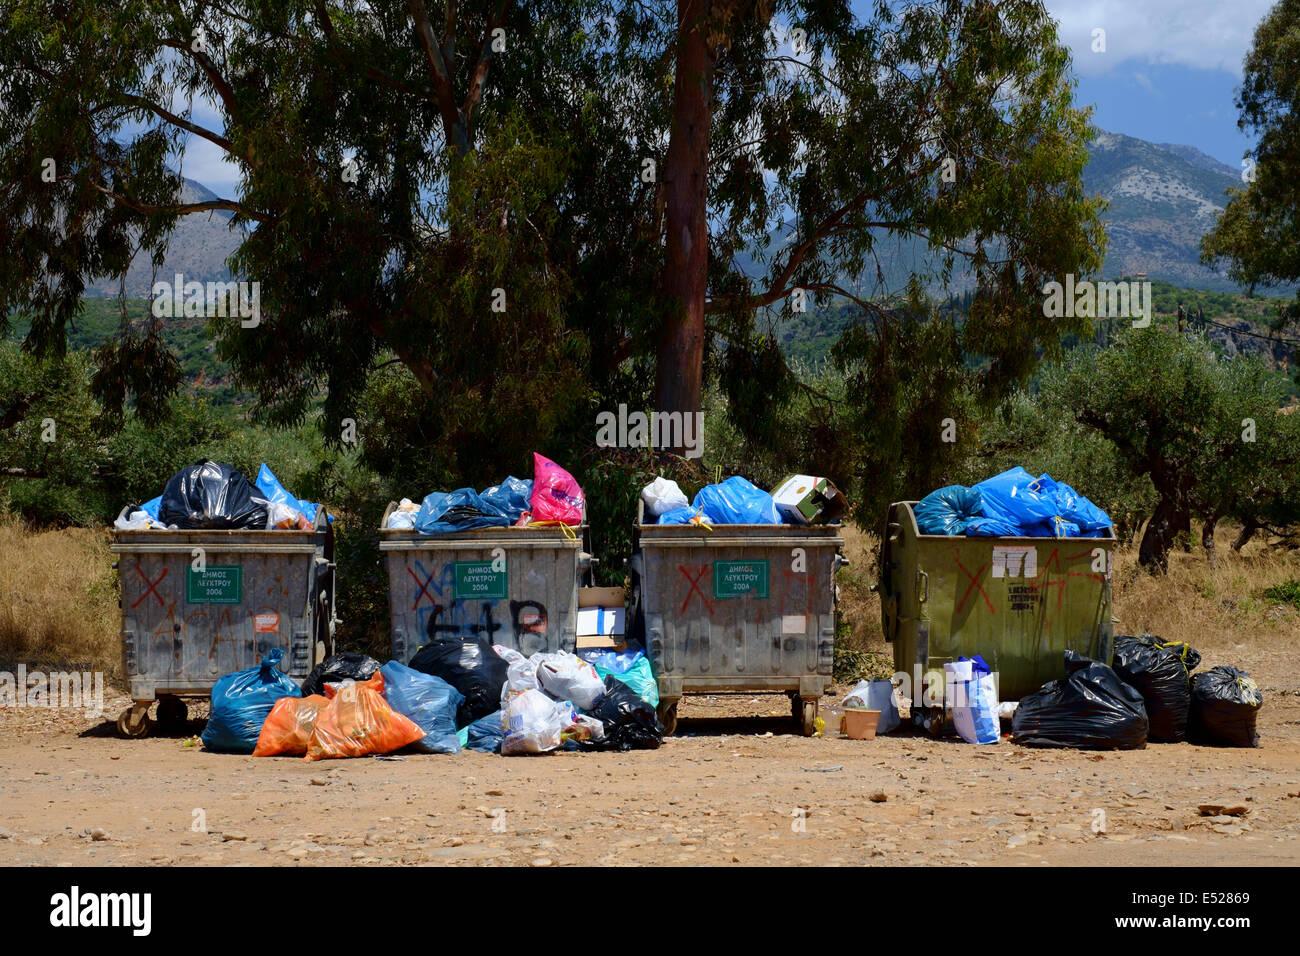 MANI PENINSULA, MESSINIA, PELOPONNESE, GREECE, 14th July 2014. Communal rubbish bins - Stock Image